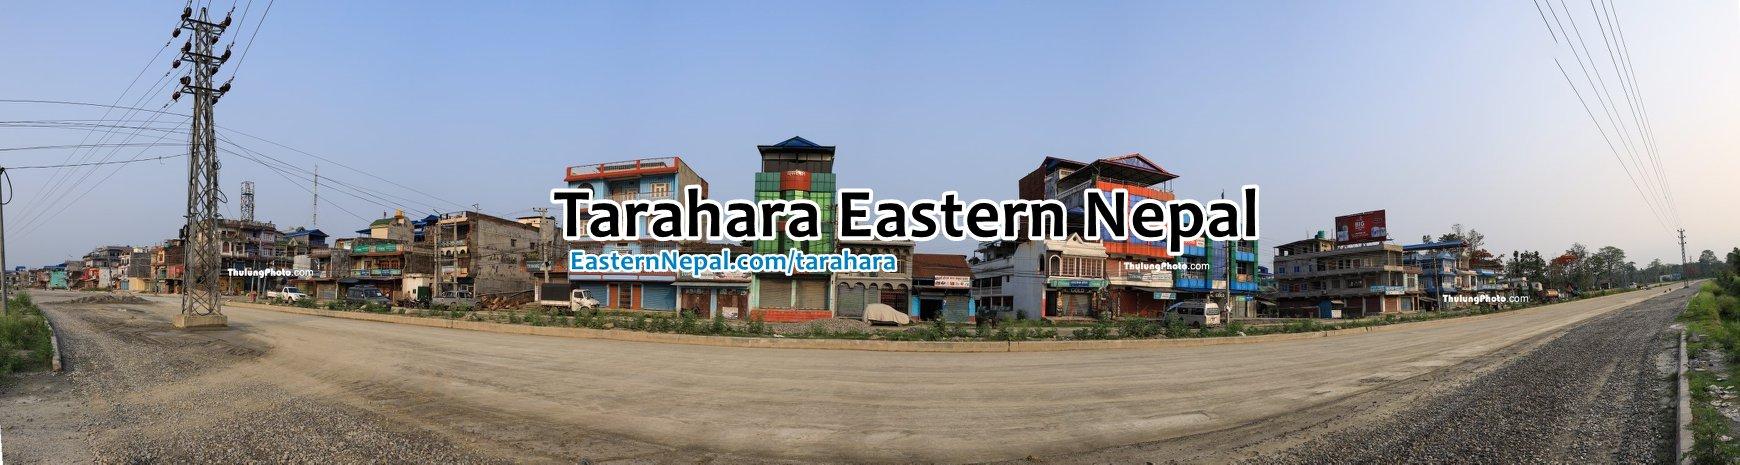 Tarahara Eastern Nepal